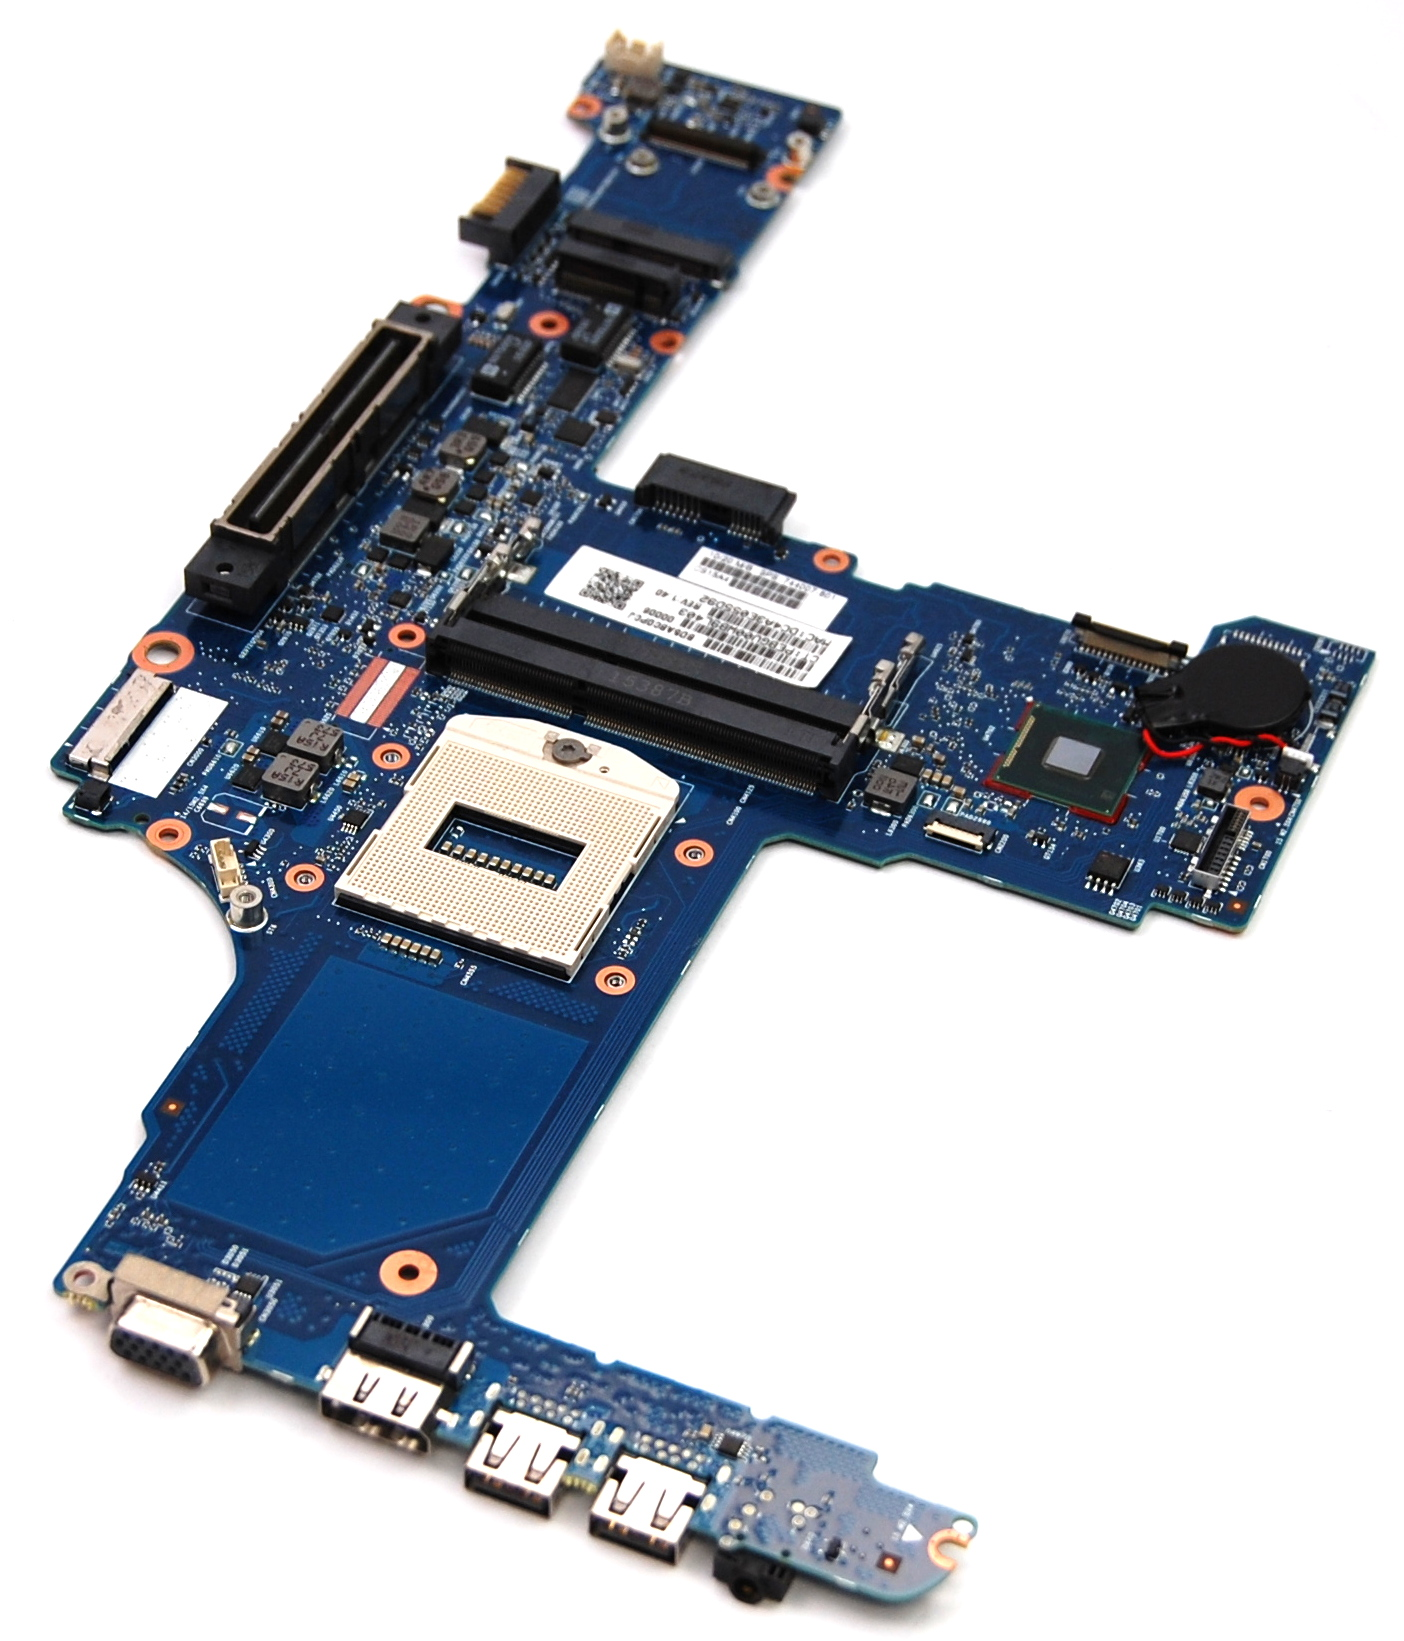 HP 744007-001 ProBook 640 G1 Socket rPGA-947 Laptop Intel Motherboard